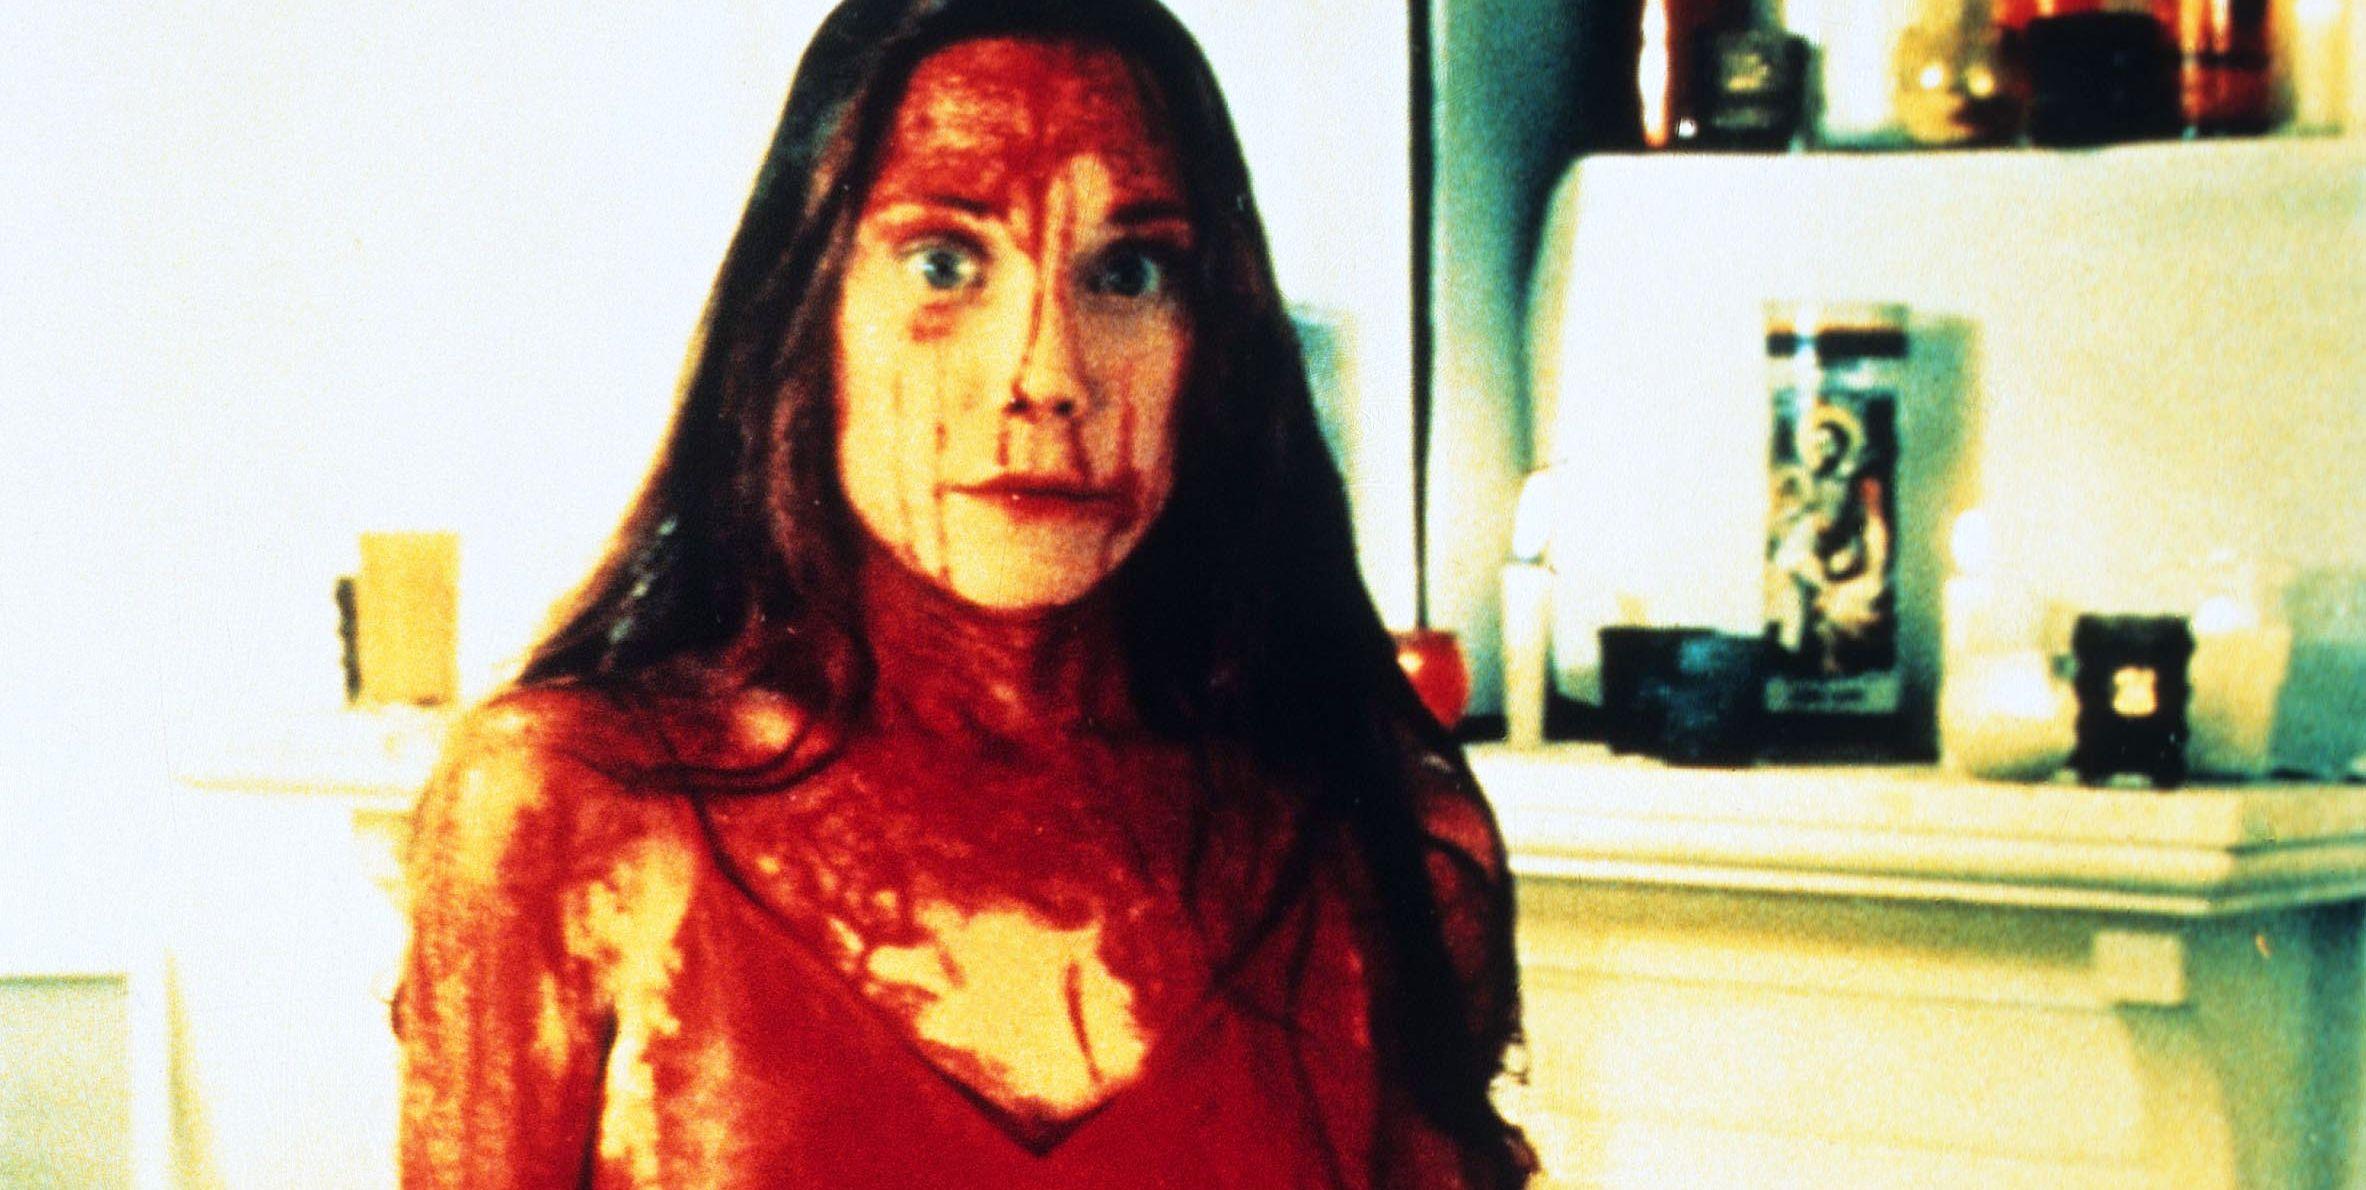 Carrie - 1976